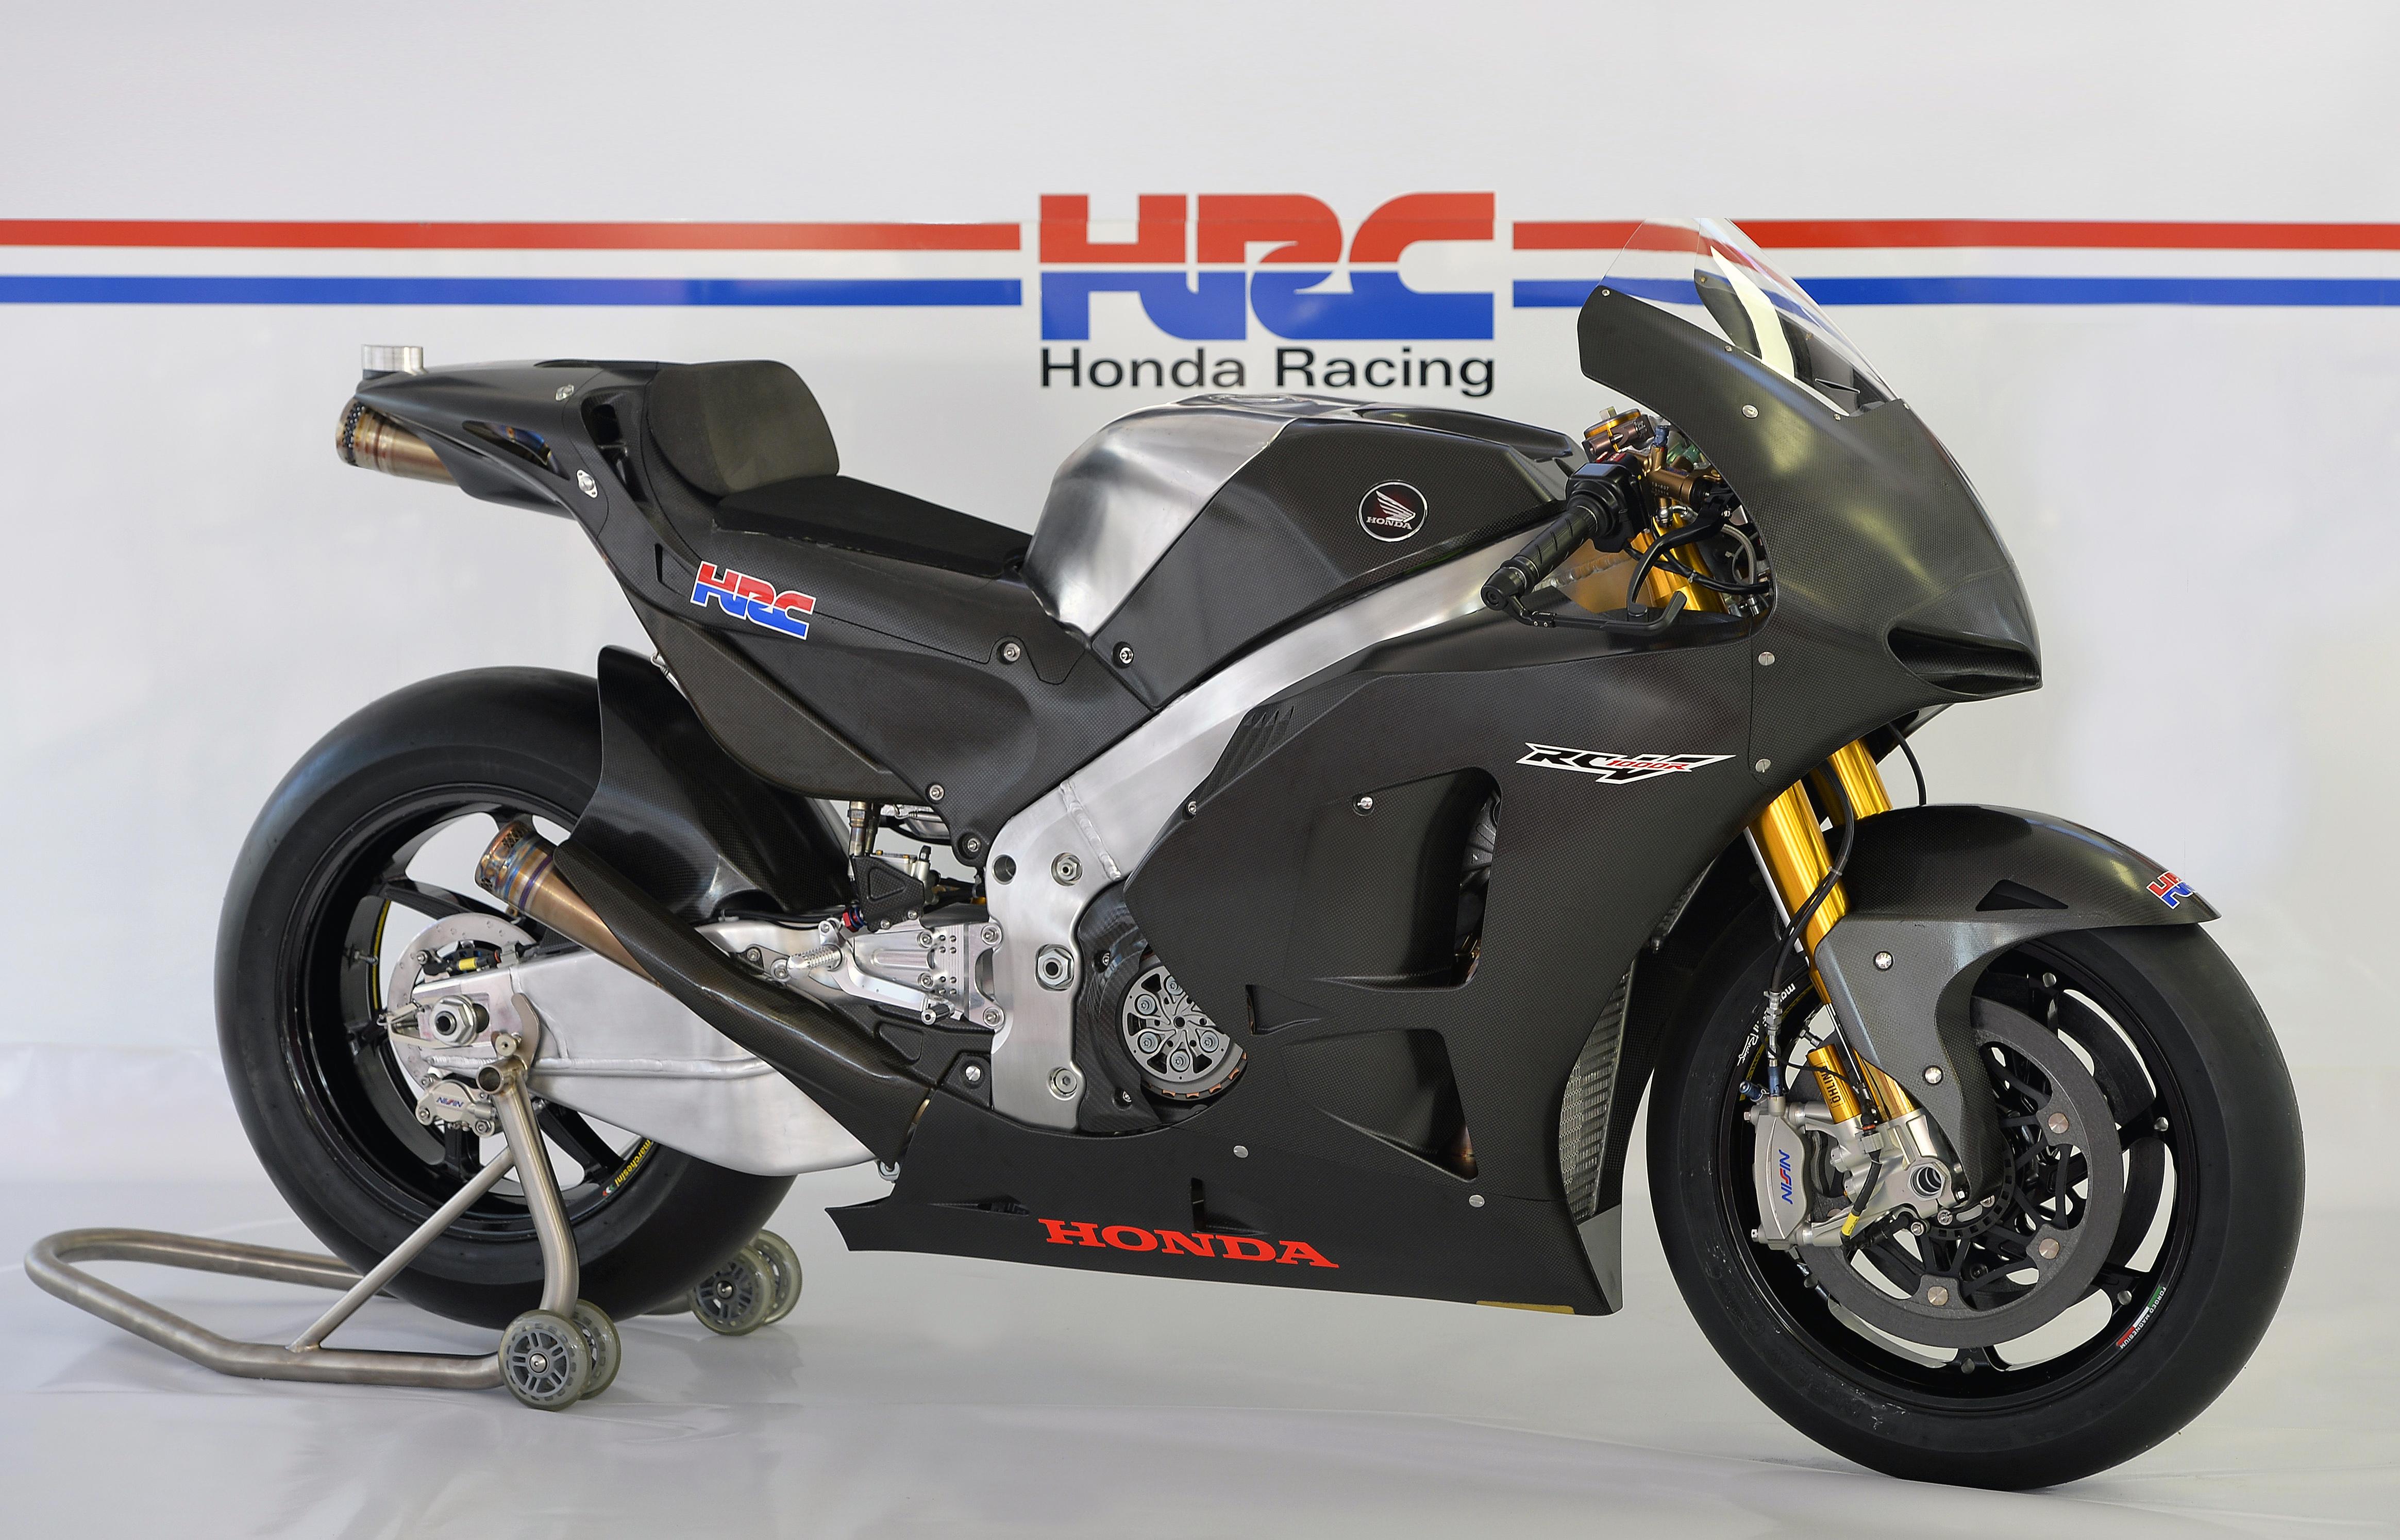 honda_rcv1000r_motogp_production_racer_www_racemoto_com_000